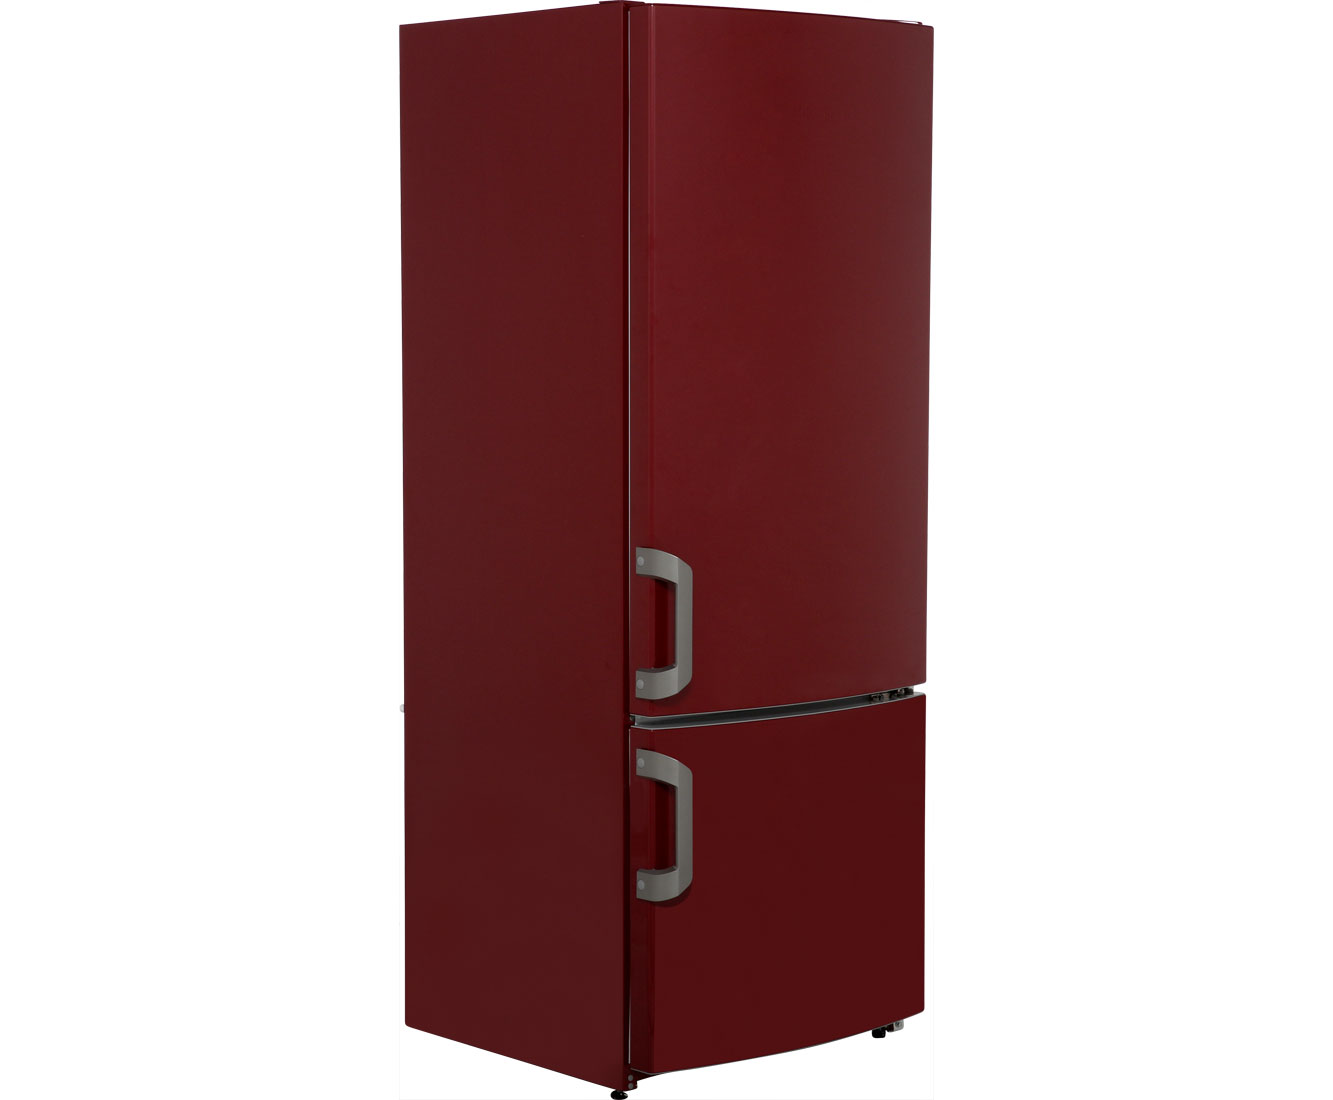 Gorenje Kühlschrank Kombi : Gorenje rk61620r kühl gefrierkombination 60er breite bordeaux rot